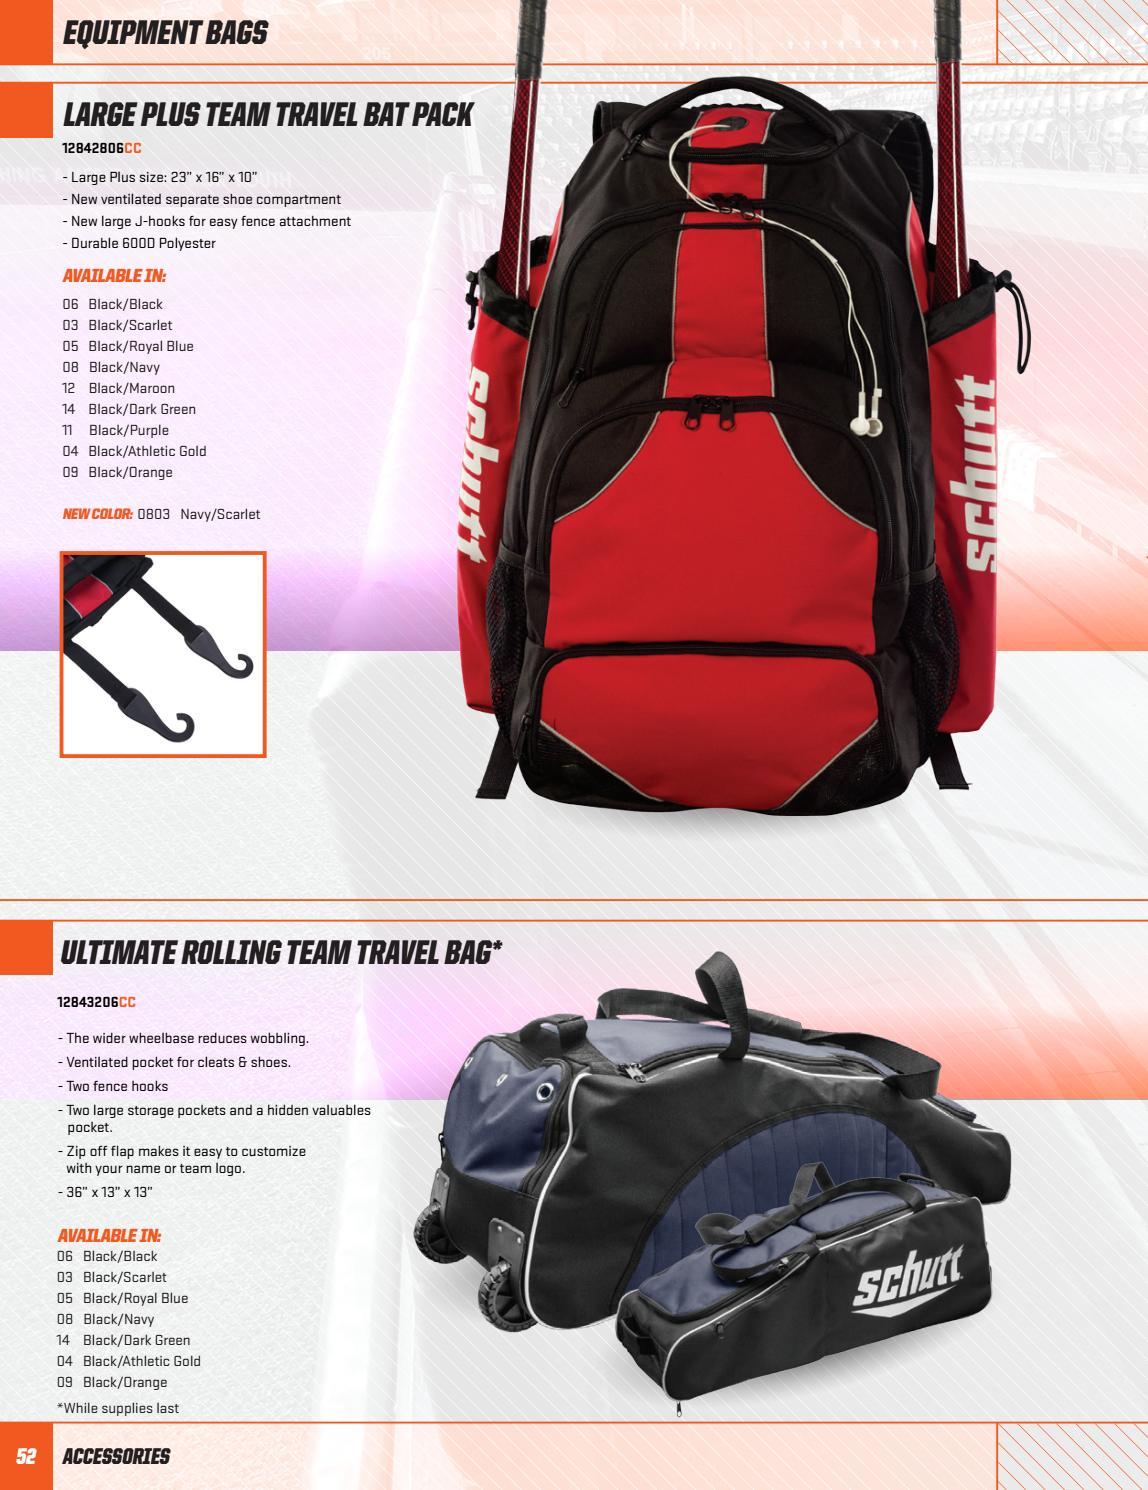 1bbfc537f331 Schutt Baseball Softball Catalog 2018 by LTS - Legacy Team Sales - issuu